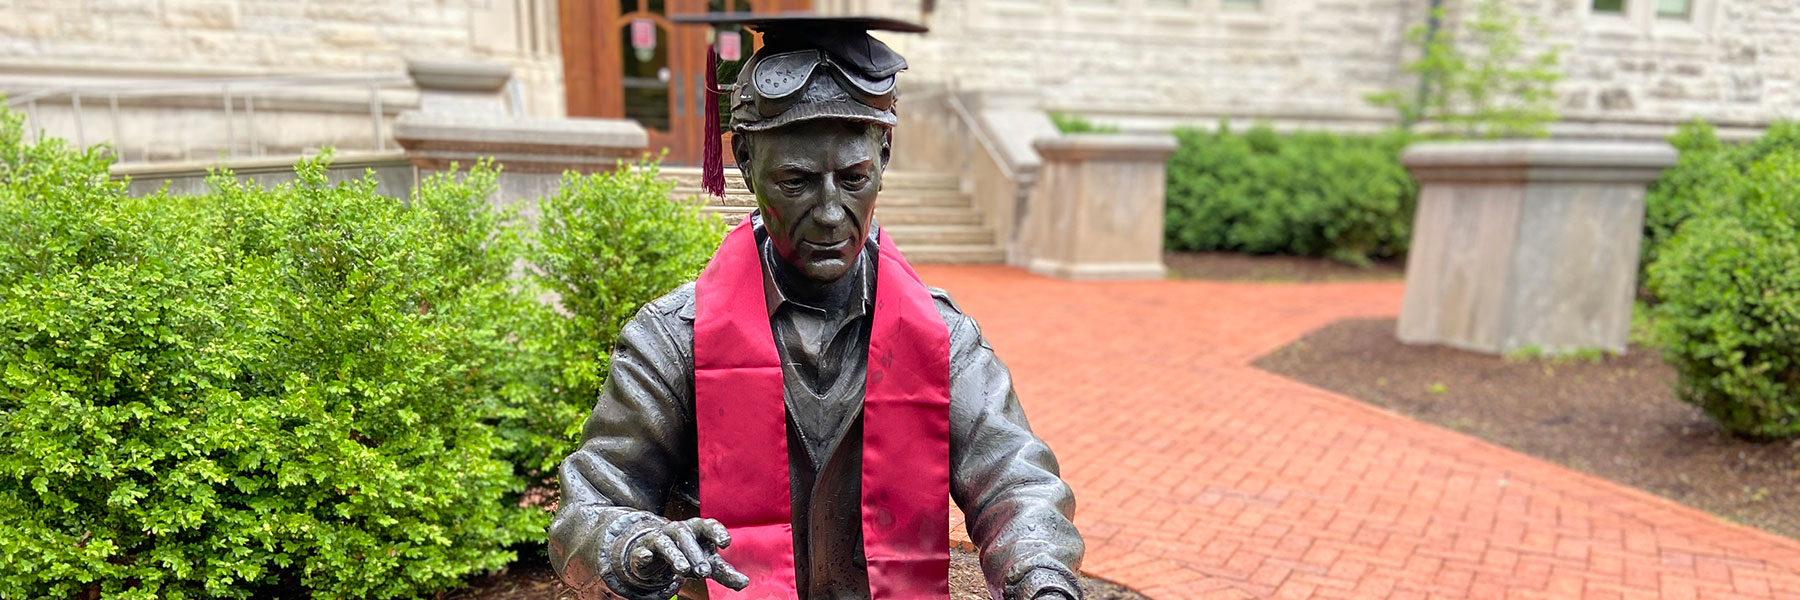 Congratulations Alumni Giving The Media School Indiana University Bloomington